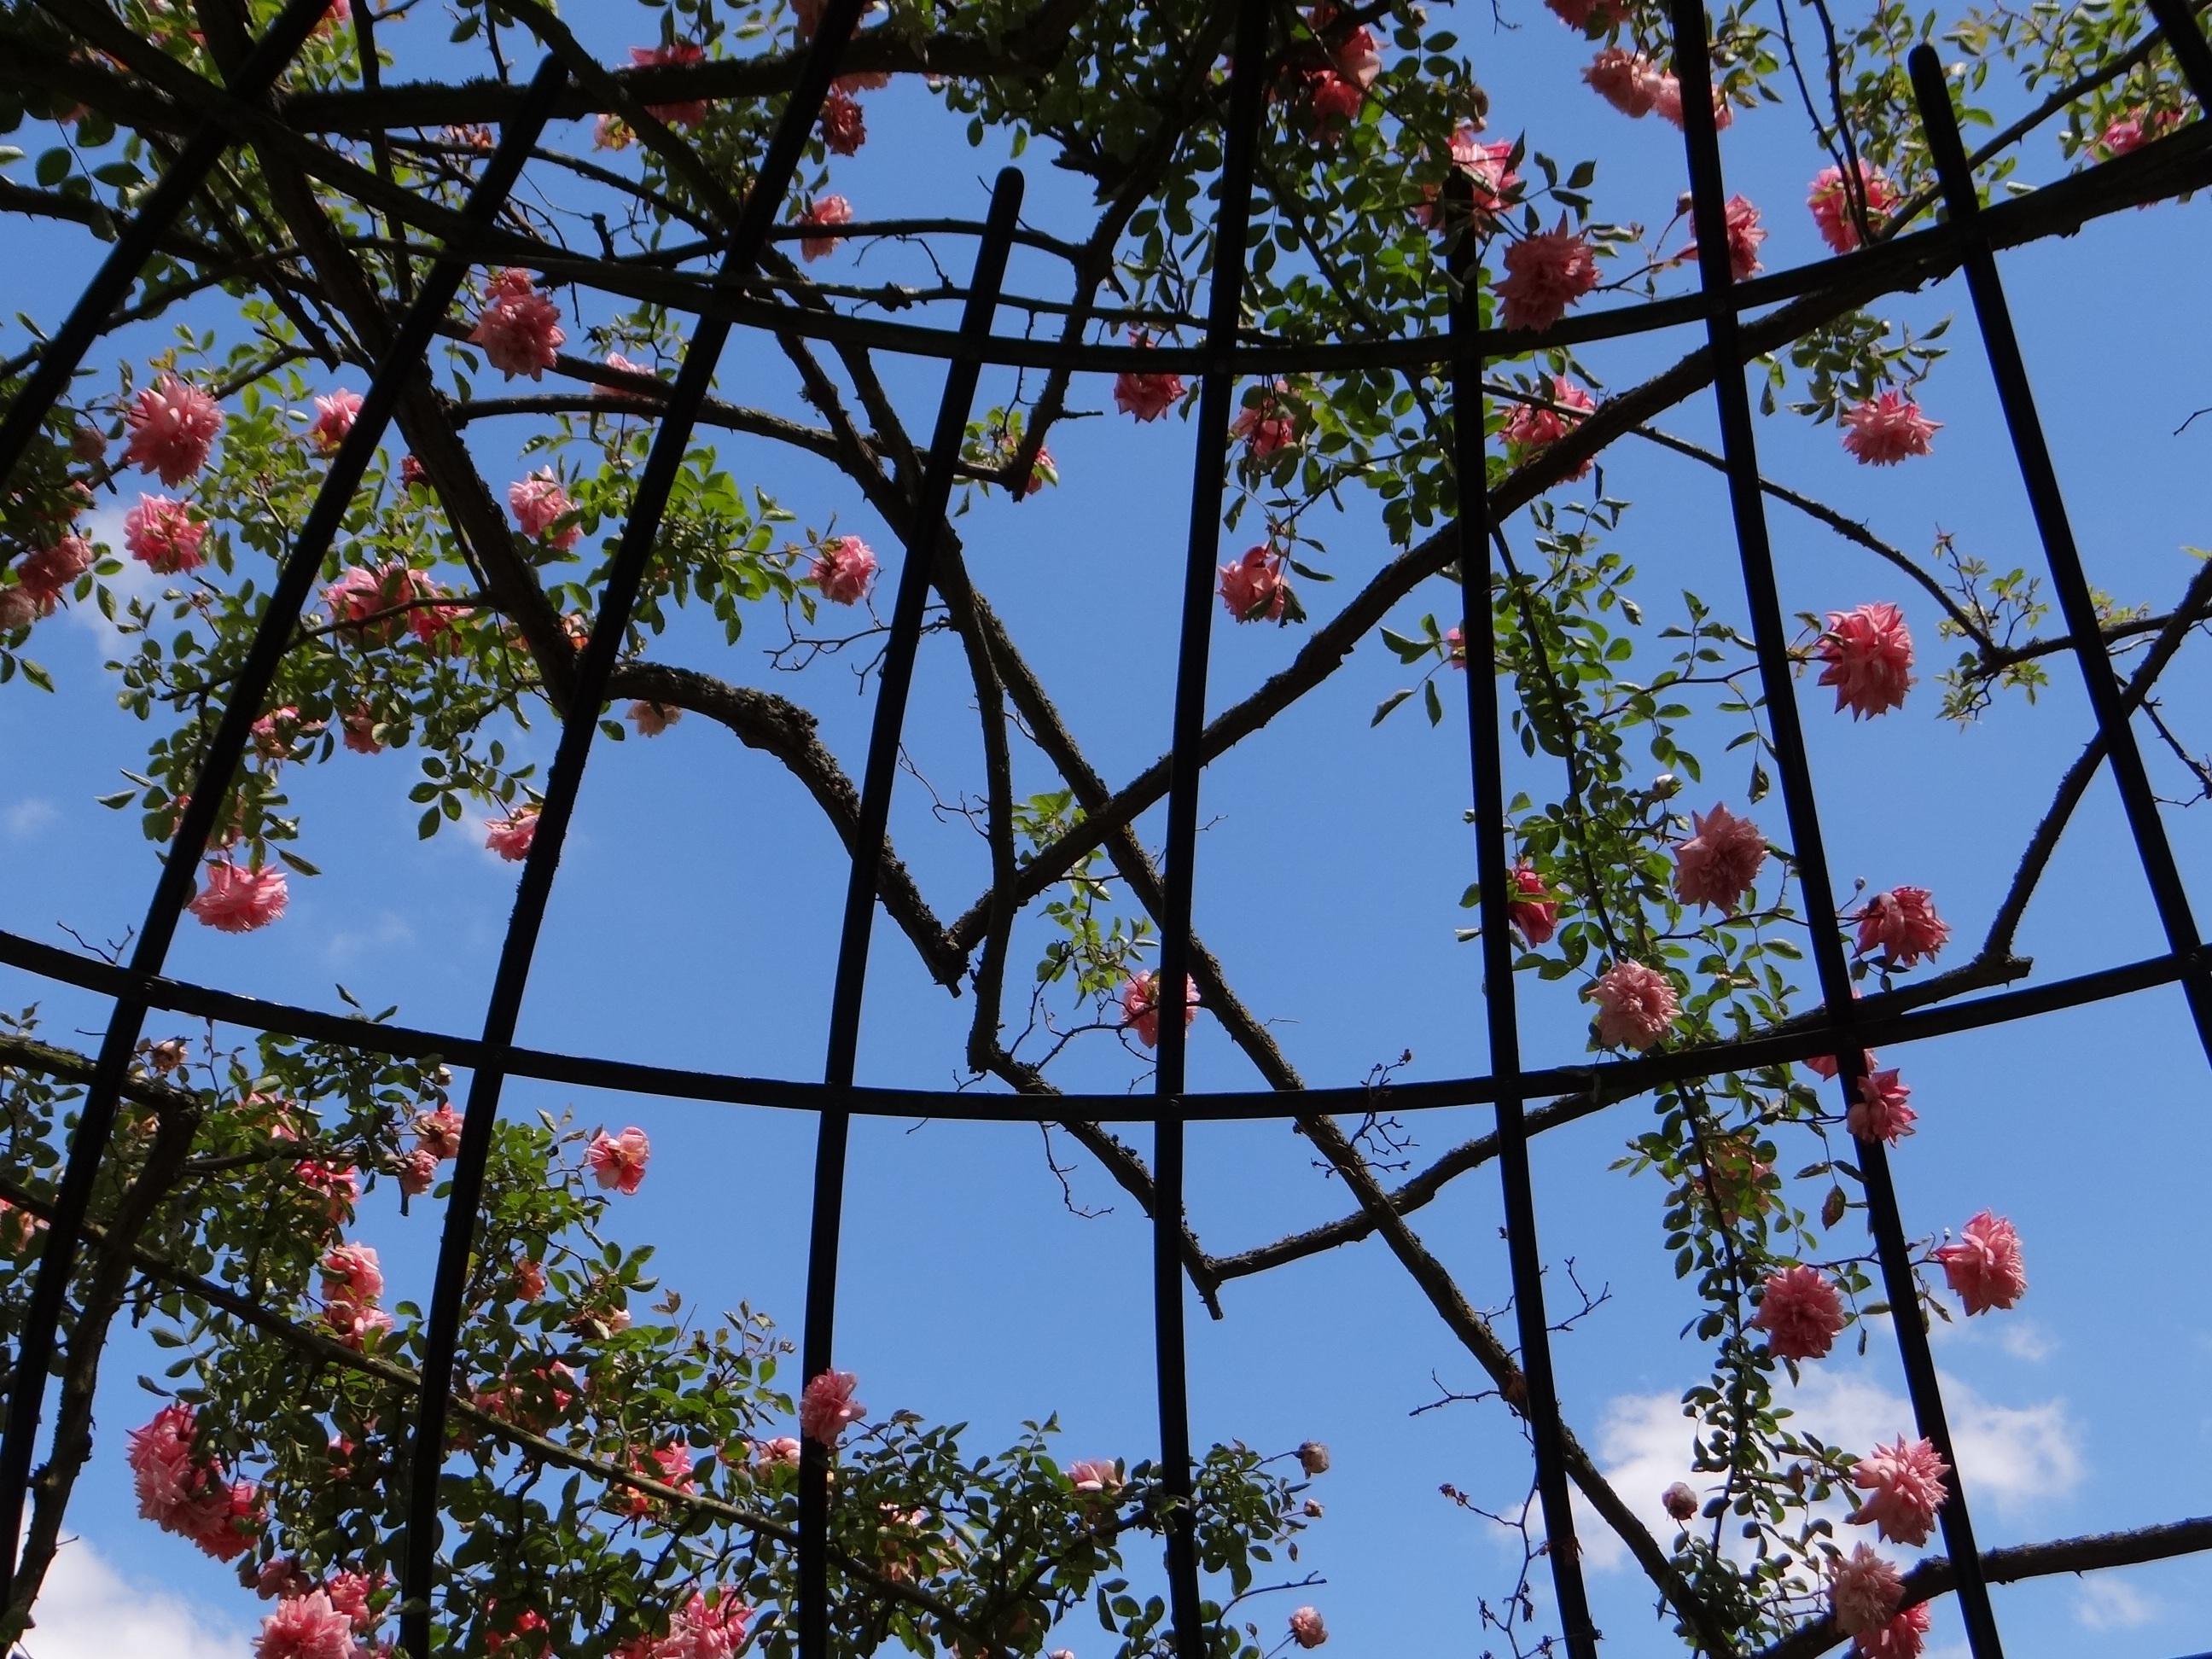 Fotos gratis : árbol, naturaleza, rama, planta, cielo, sol, hoja ...